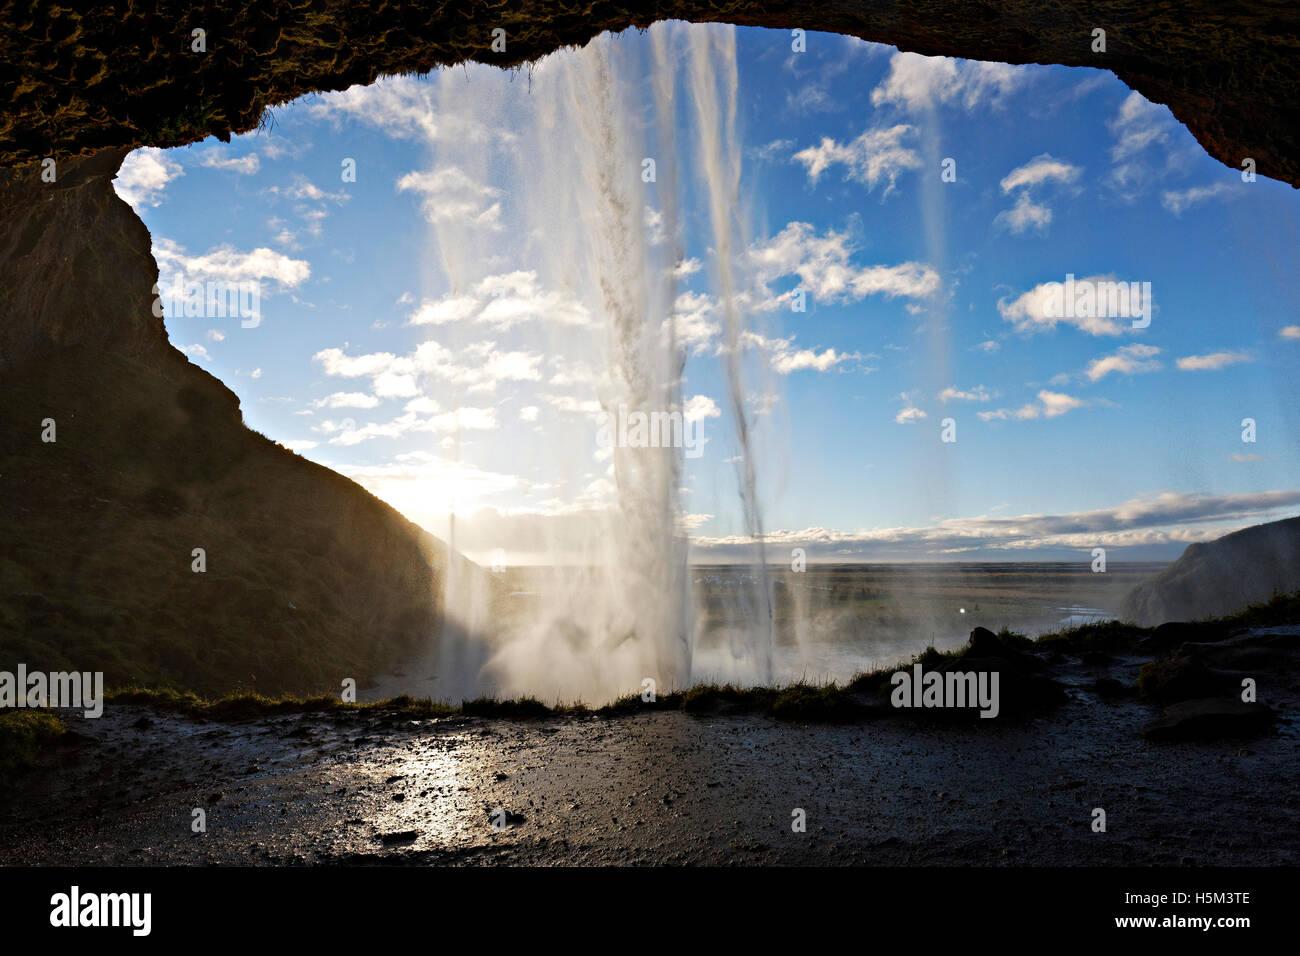 Seljalandsfoss waterfall, South Iceland, North Atlantic, Europe - Stock Image